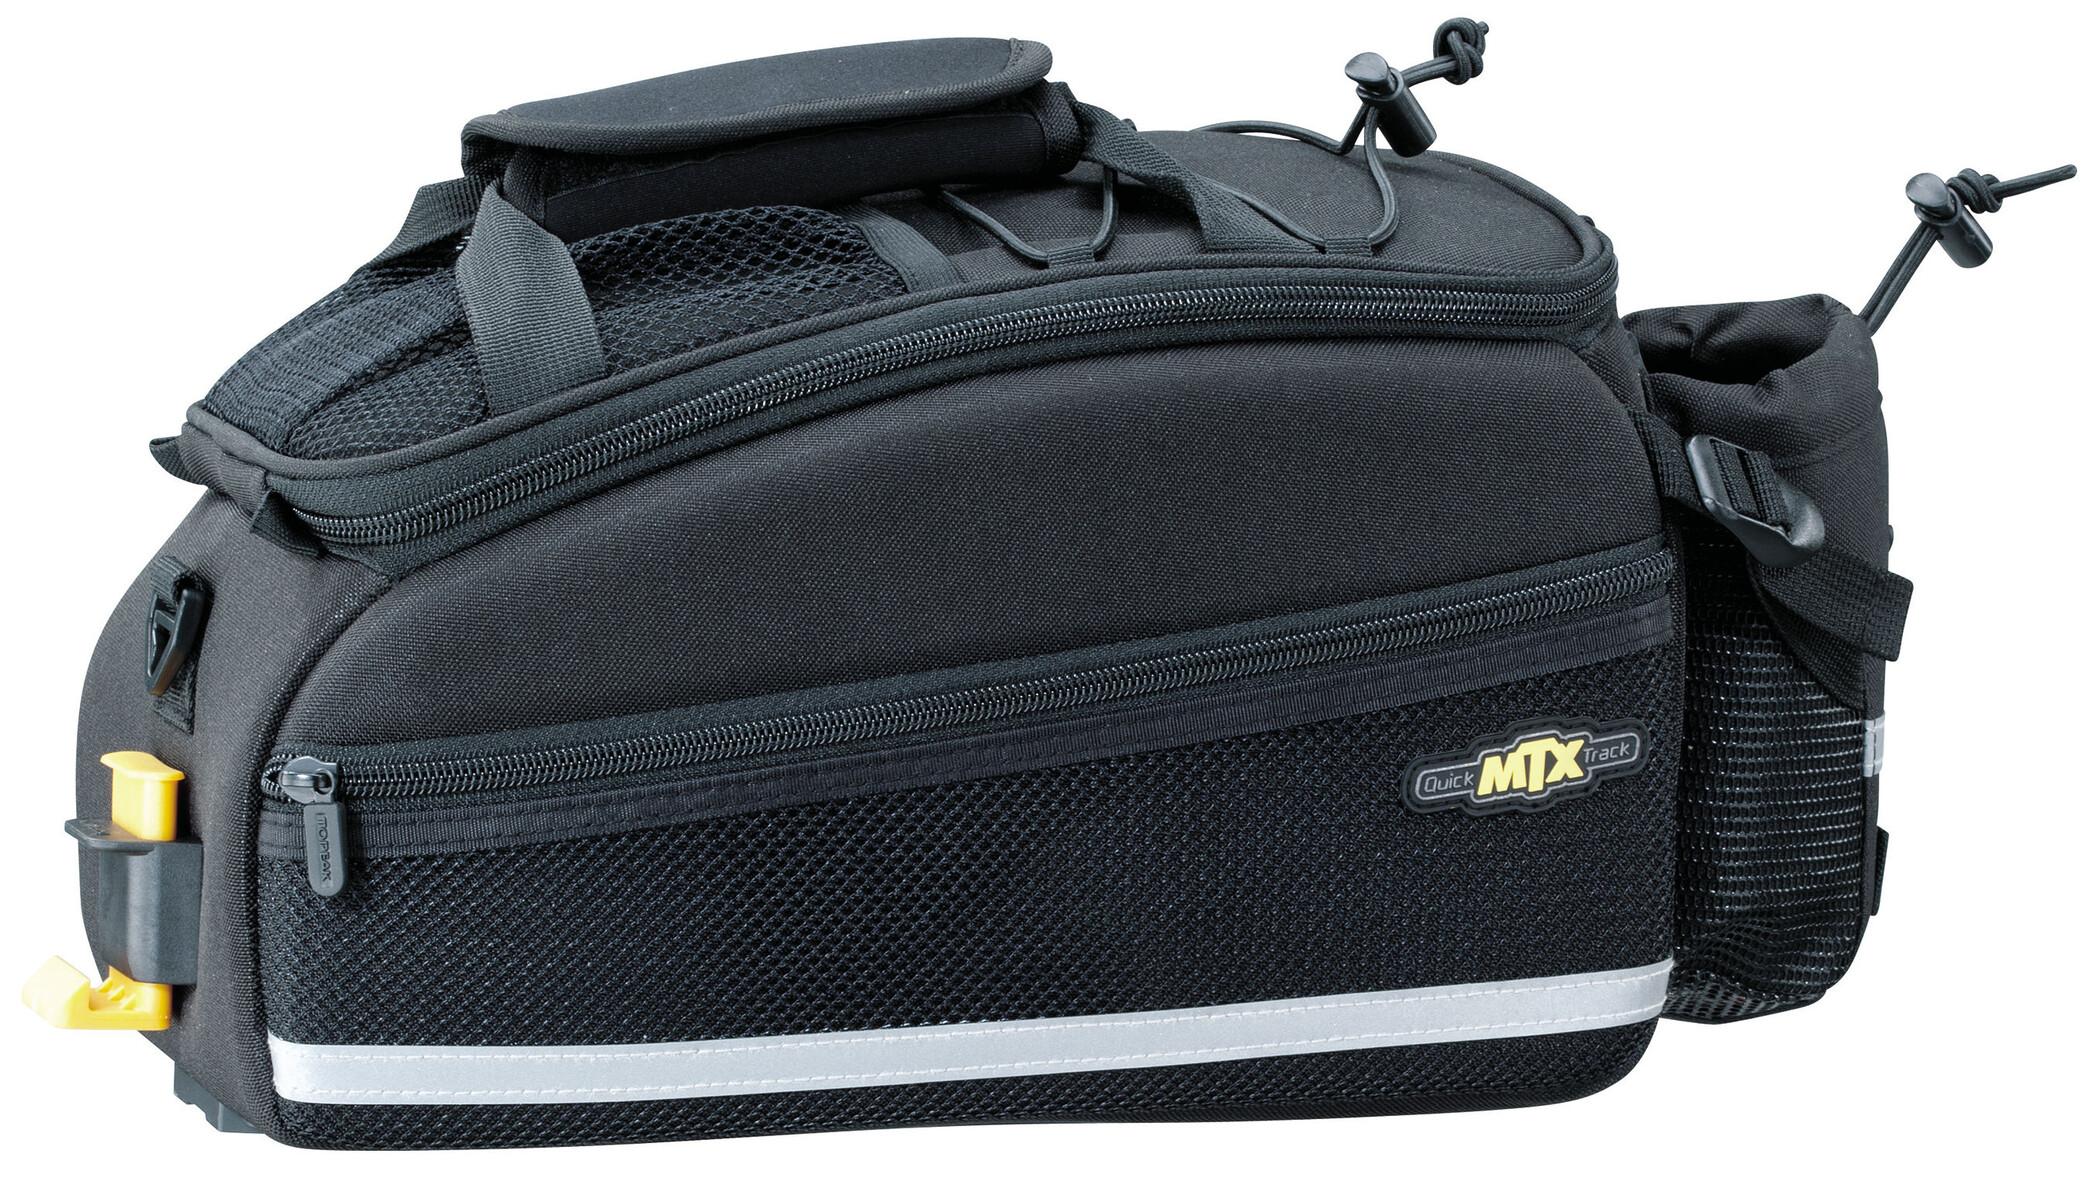 Topeak MTX Trunk Bag EX Luggage Carrier Bag black